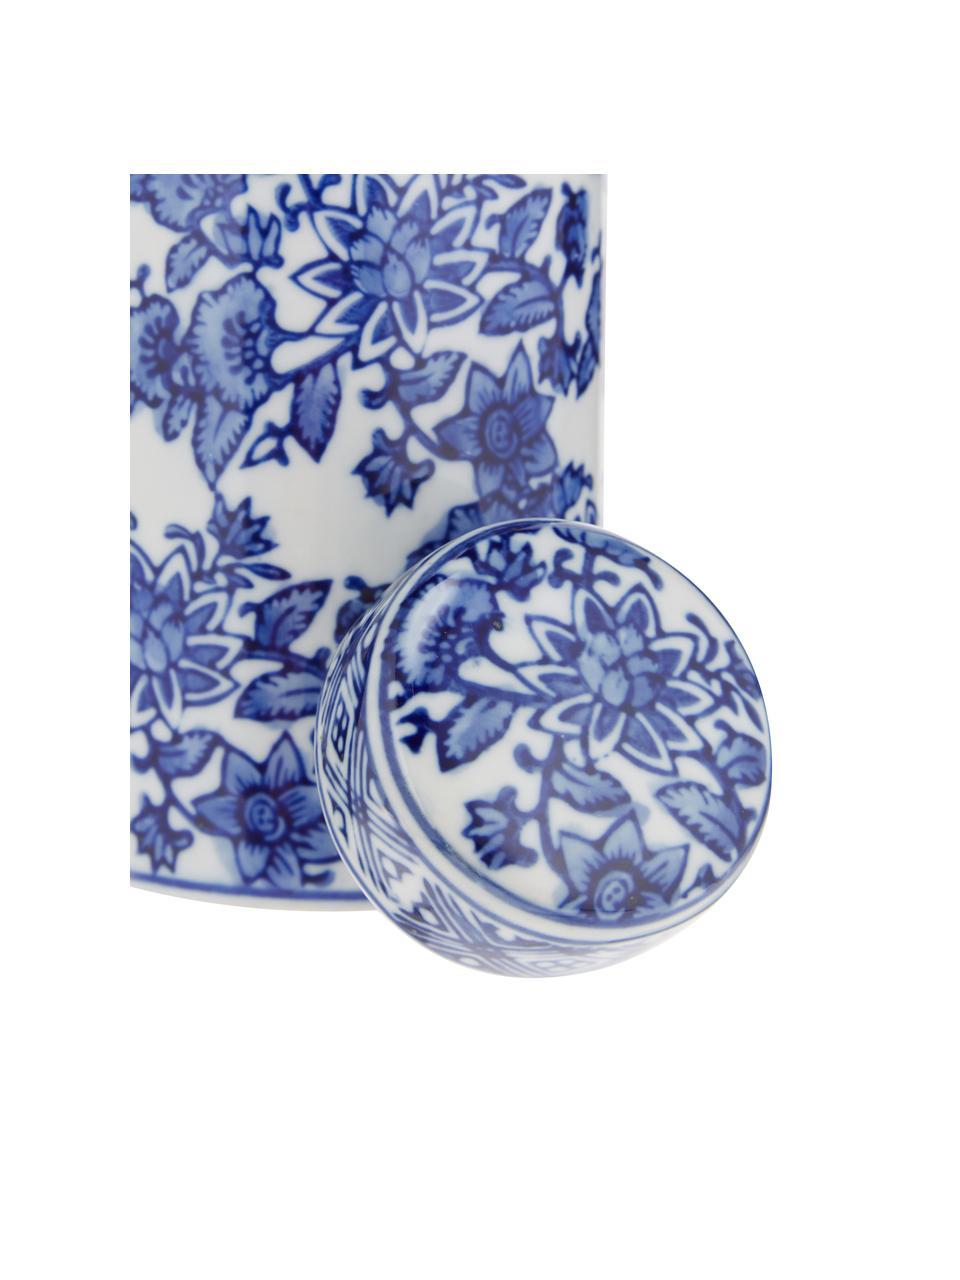 Vaso in porcellana  con coperchio Annabelle, Porcellana, Blu,bianco, Ø 8 cm x Alt. 14 cm